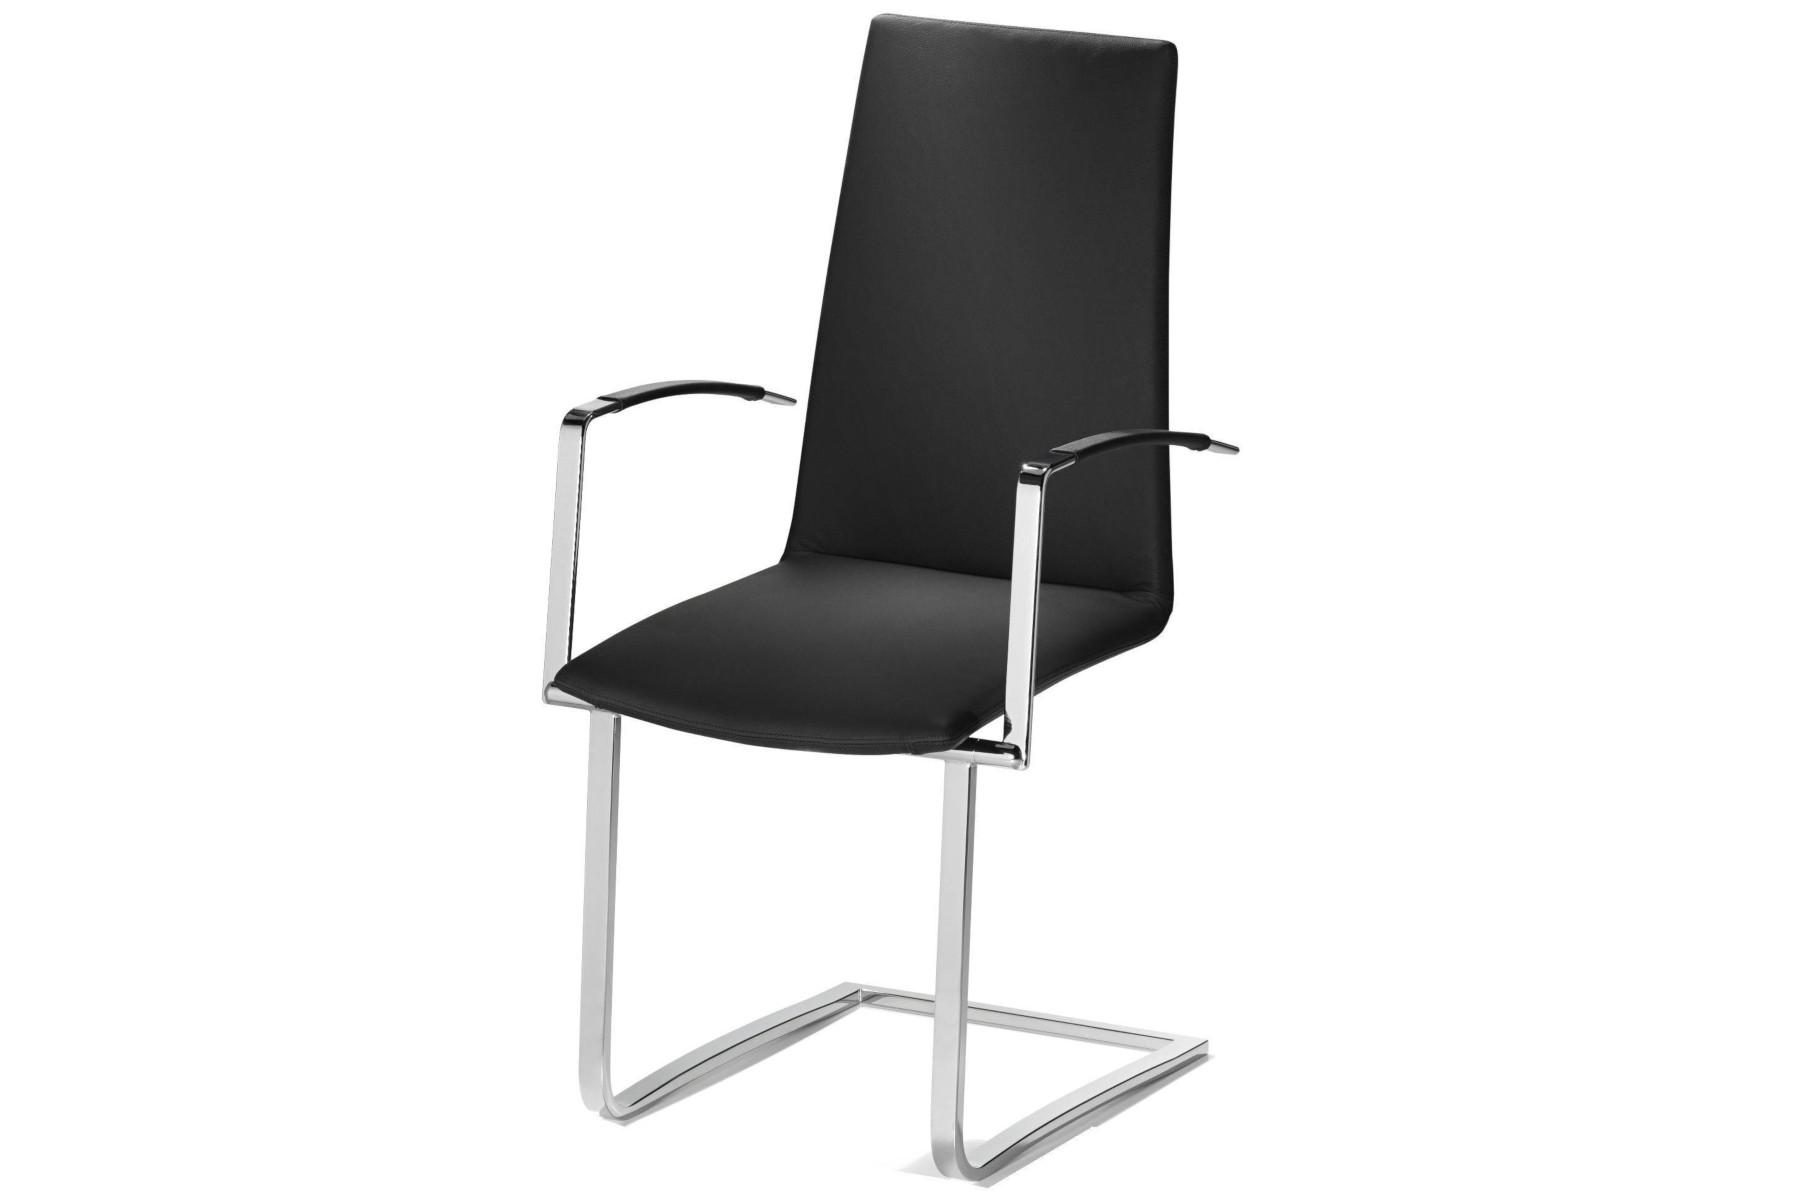 Bacher Stühle Armlehnen KAMA